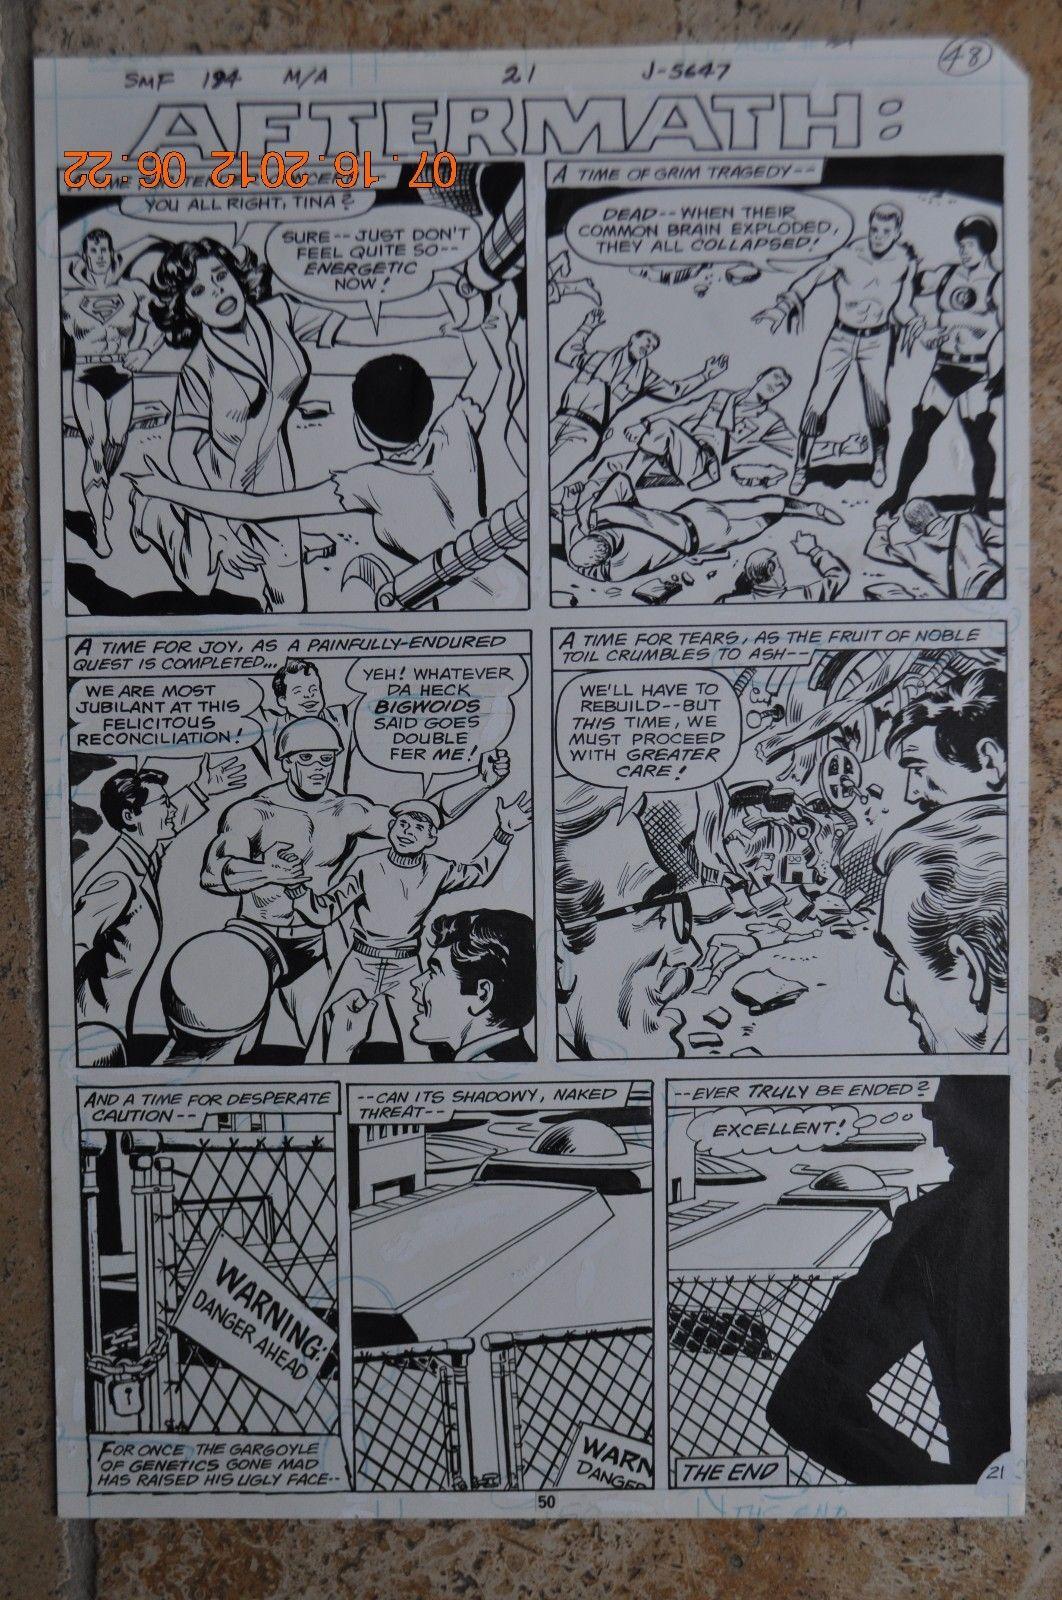 Superman Family #194, Pg #21,John Calnan/Vince Colletta, The Guardian, Lois Lane